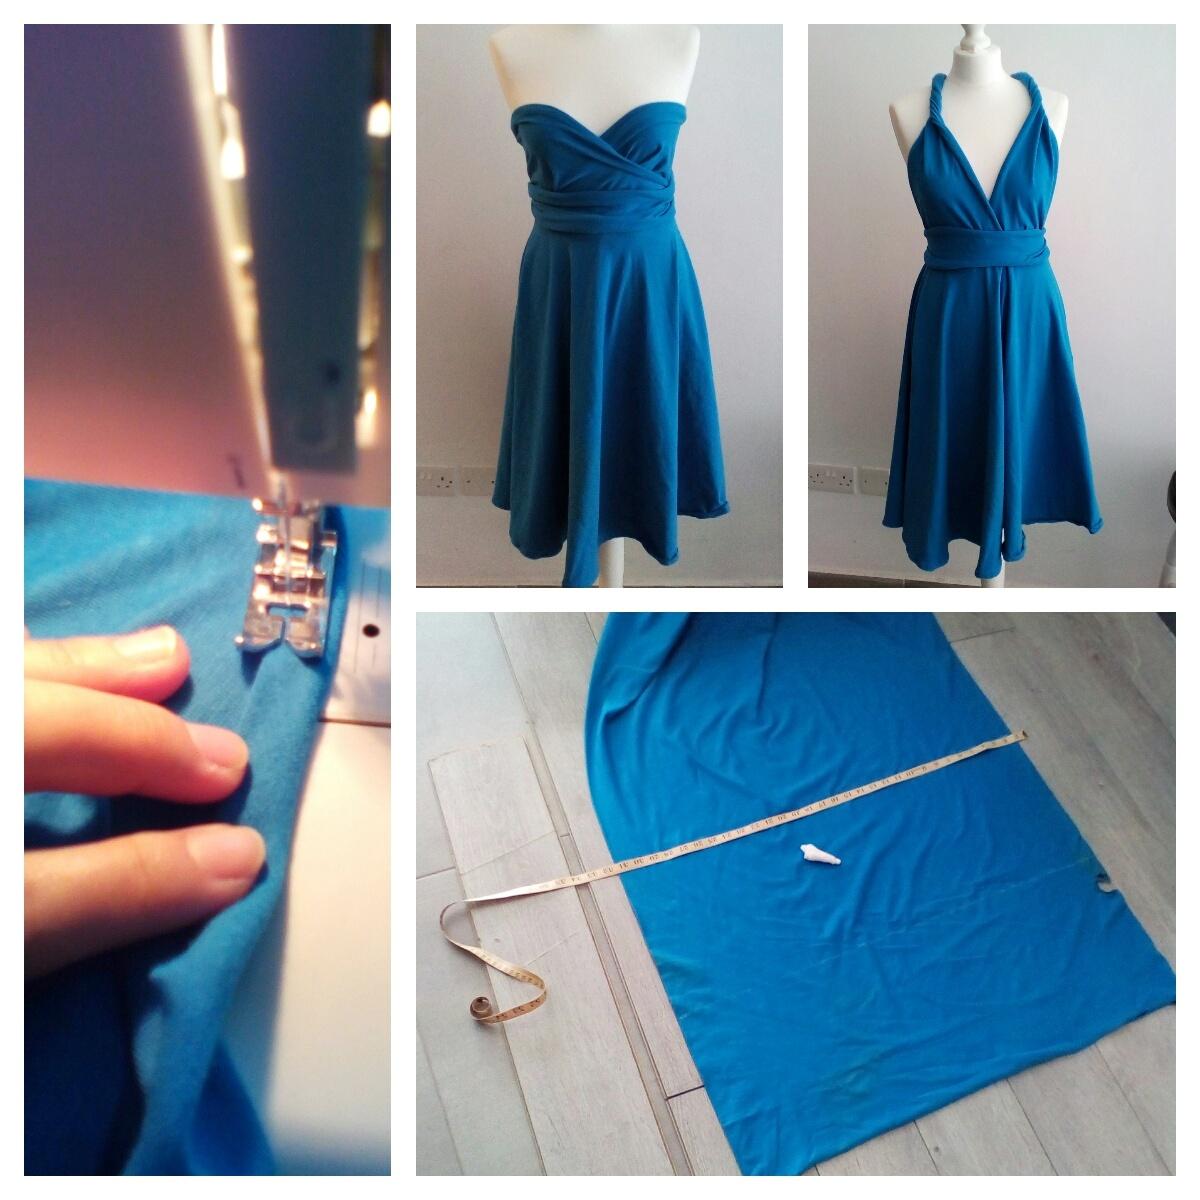 Behind the Scenes  MOLDIV-02 Dressmaking, adding gorgeous dresses to studio wardrobe